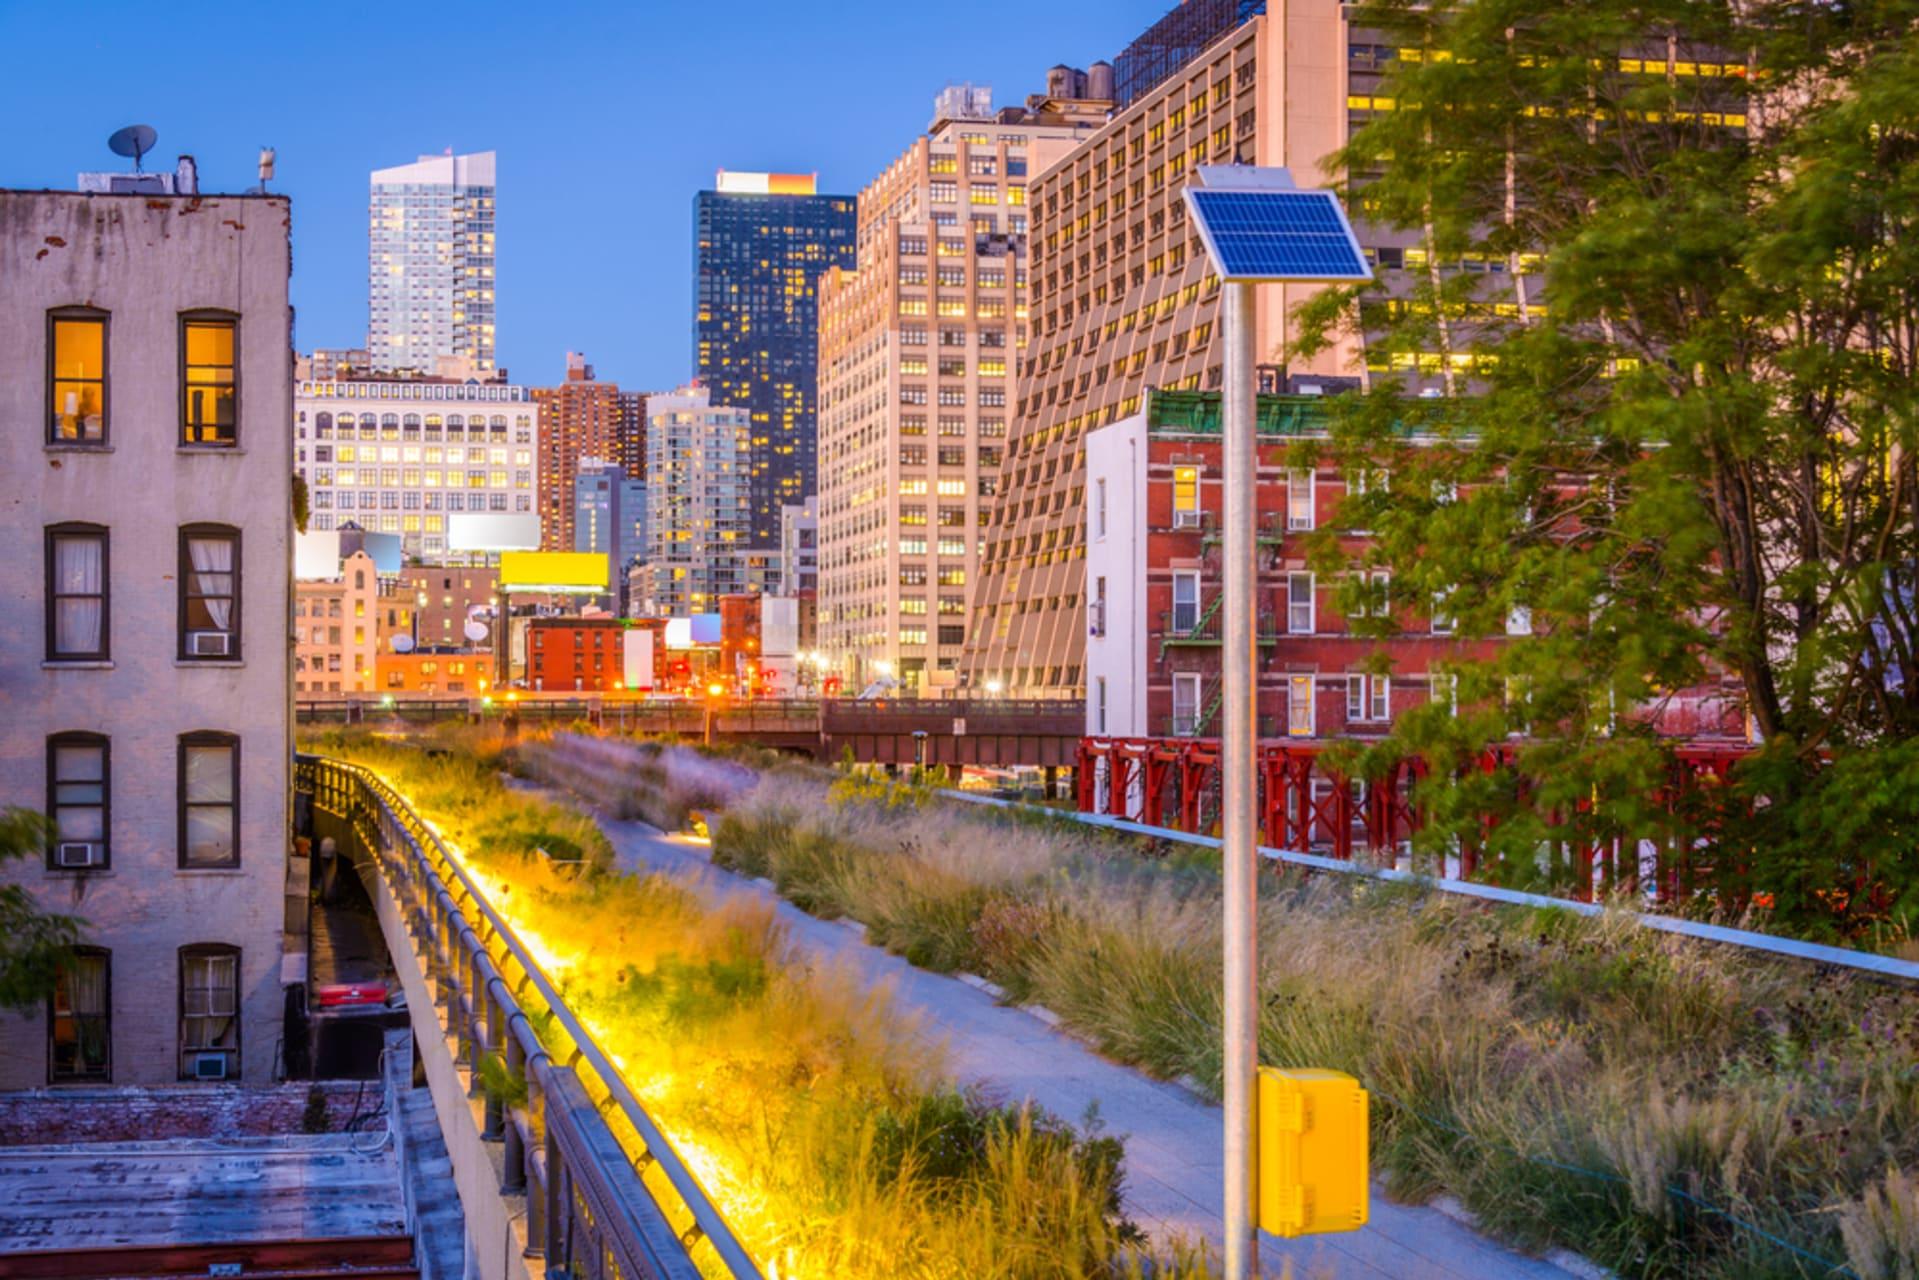 New York - The High Line & Hudson Yards